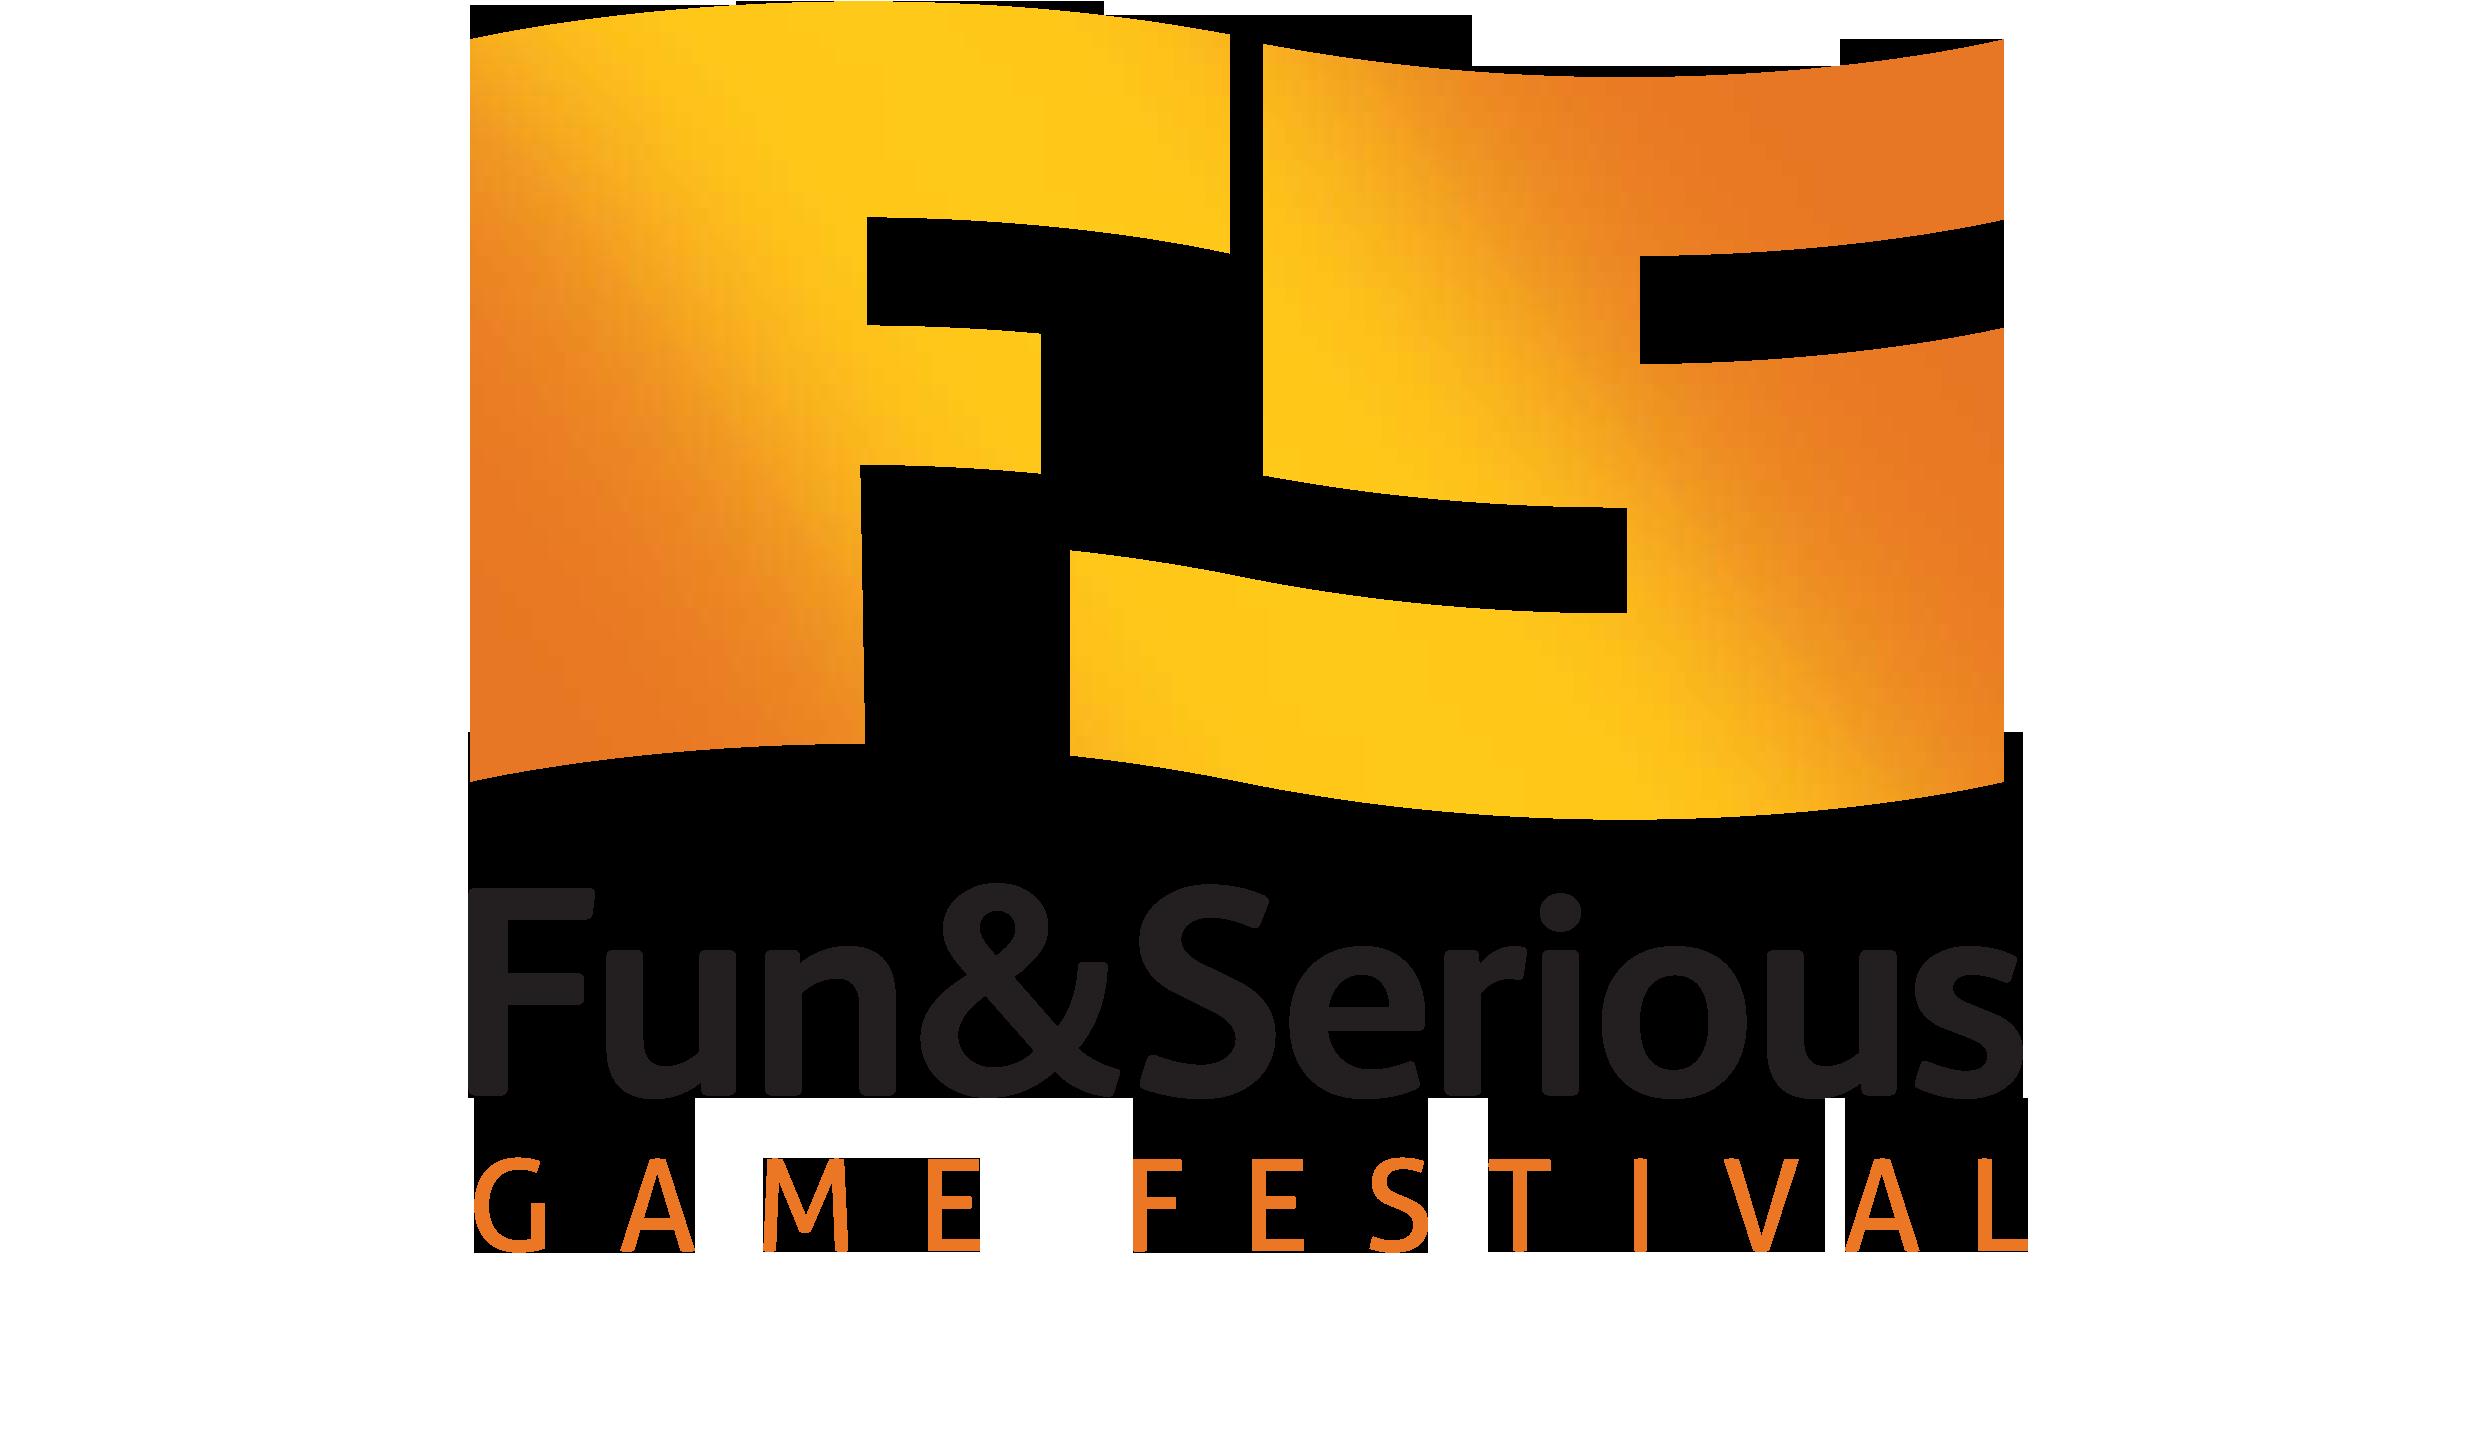 Fun & Serious Festival